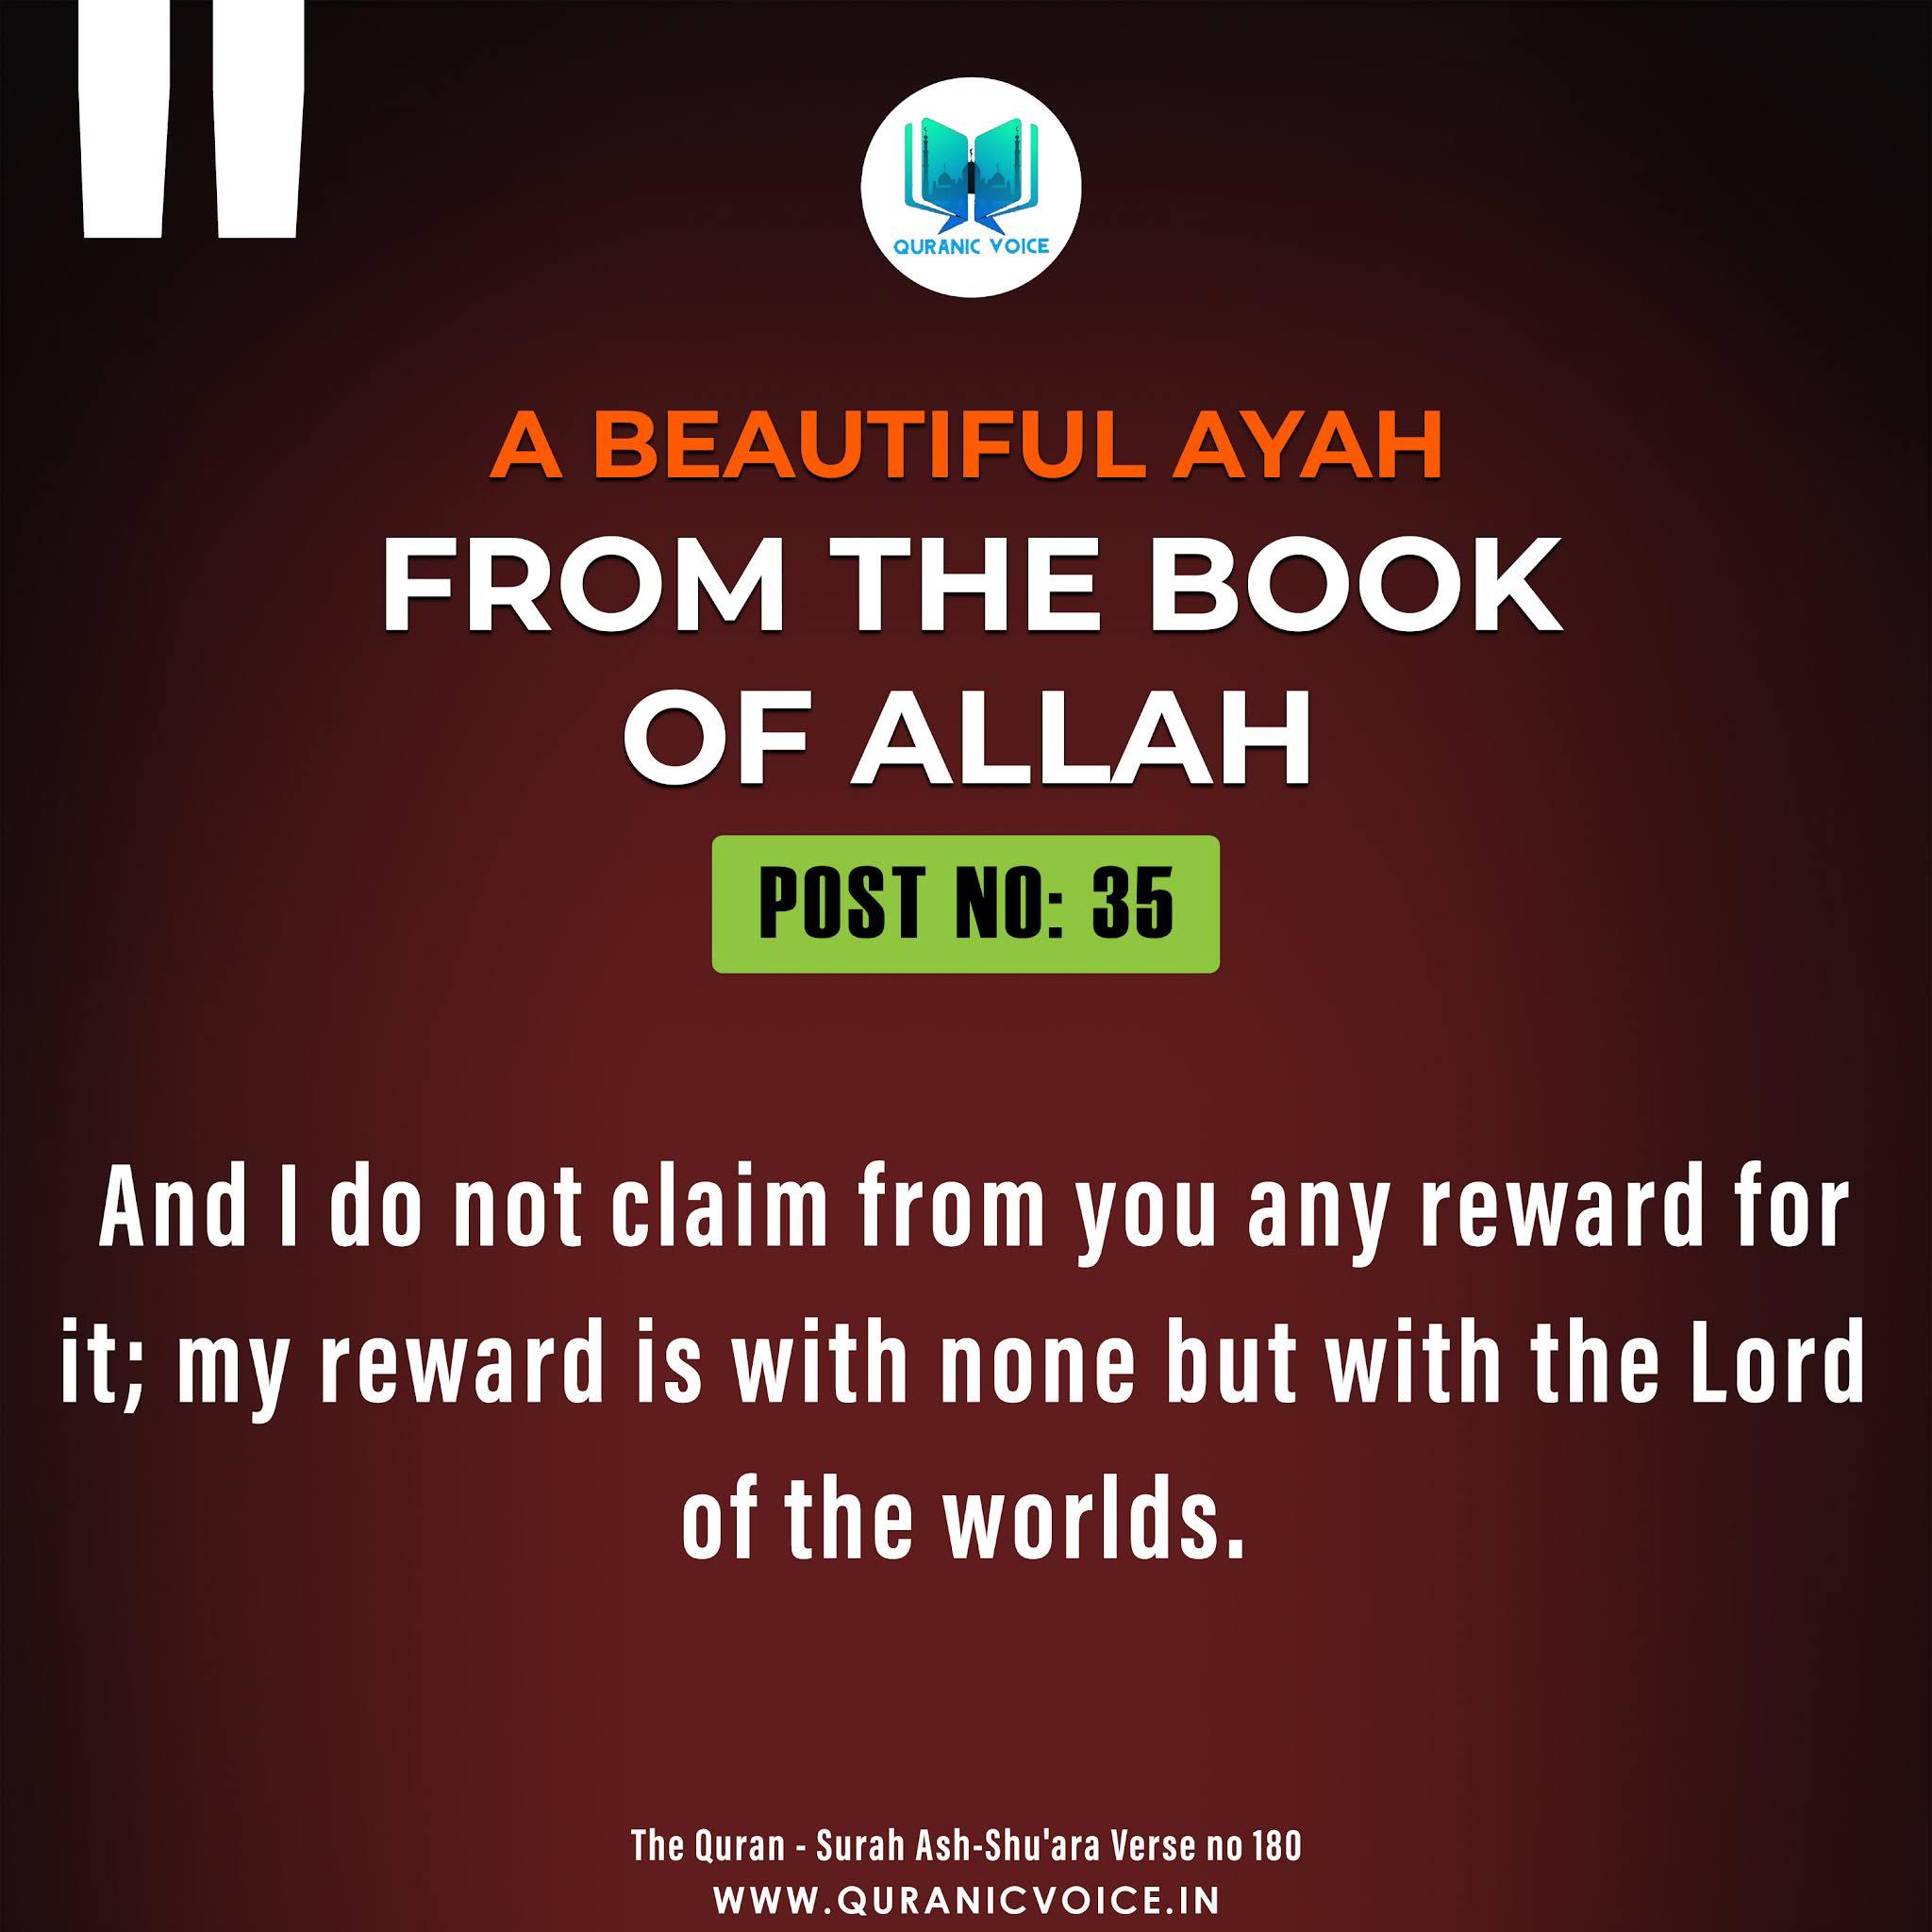 A beautiful ayah from the Book Of Allah {The Quran - Surah Ash-Shu'ara Verse no 180}